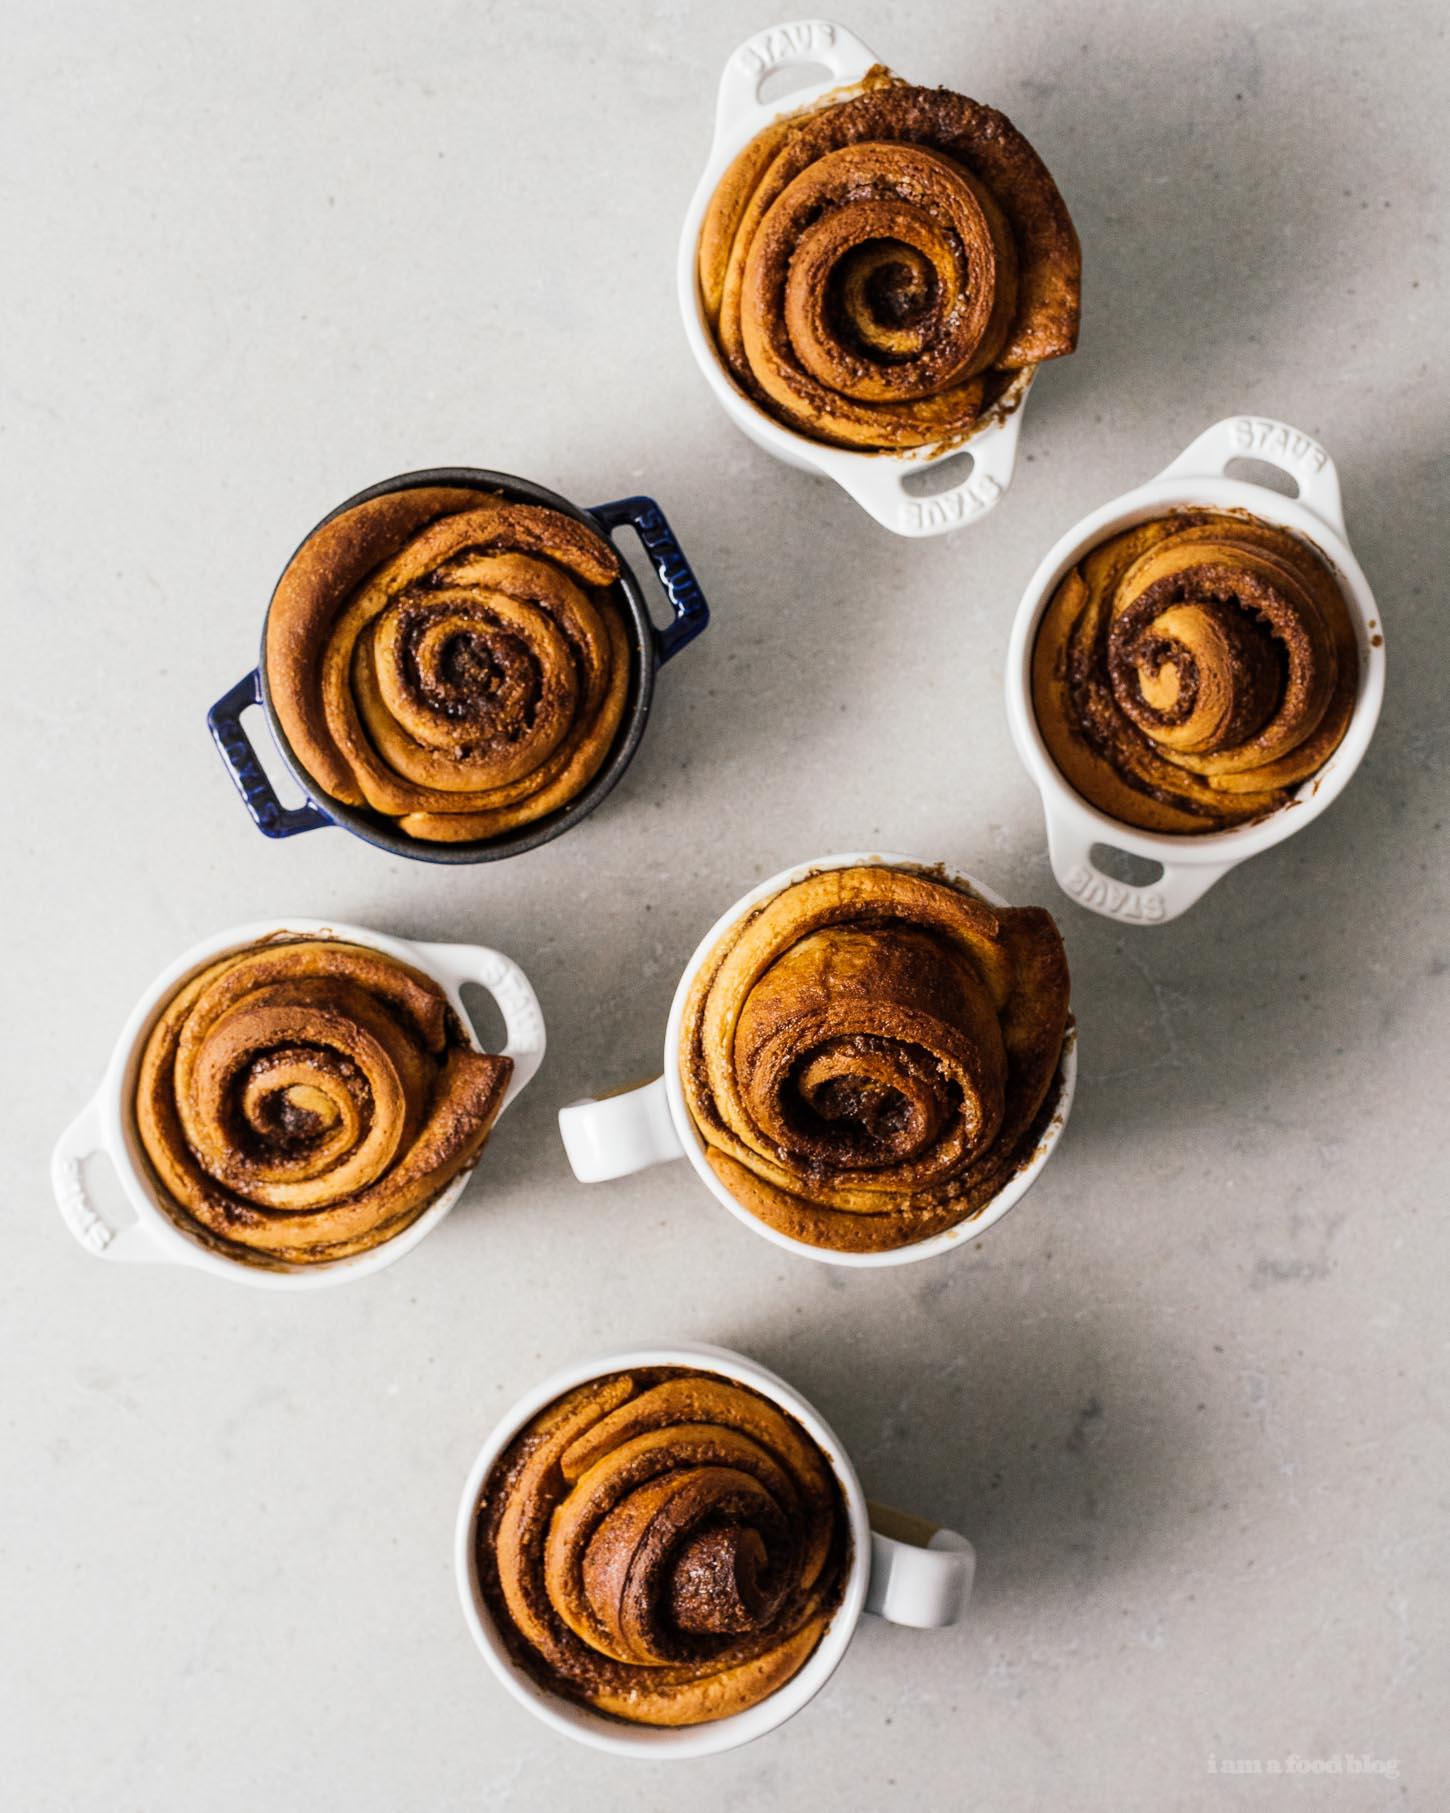 The Best Ever Overnight Cinnamon Rolls Recipe | www.iamafoodblog.com